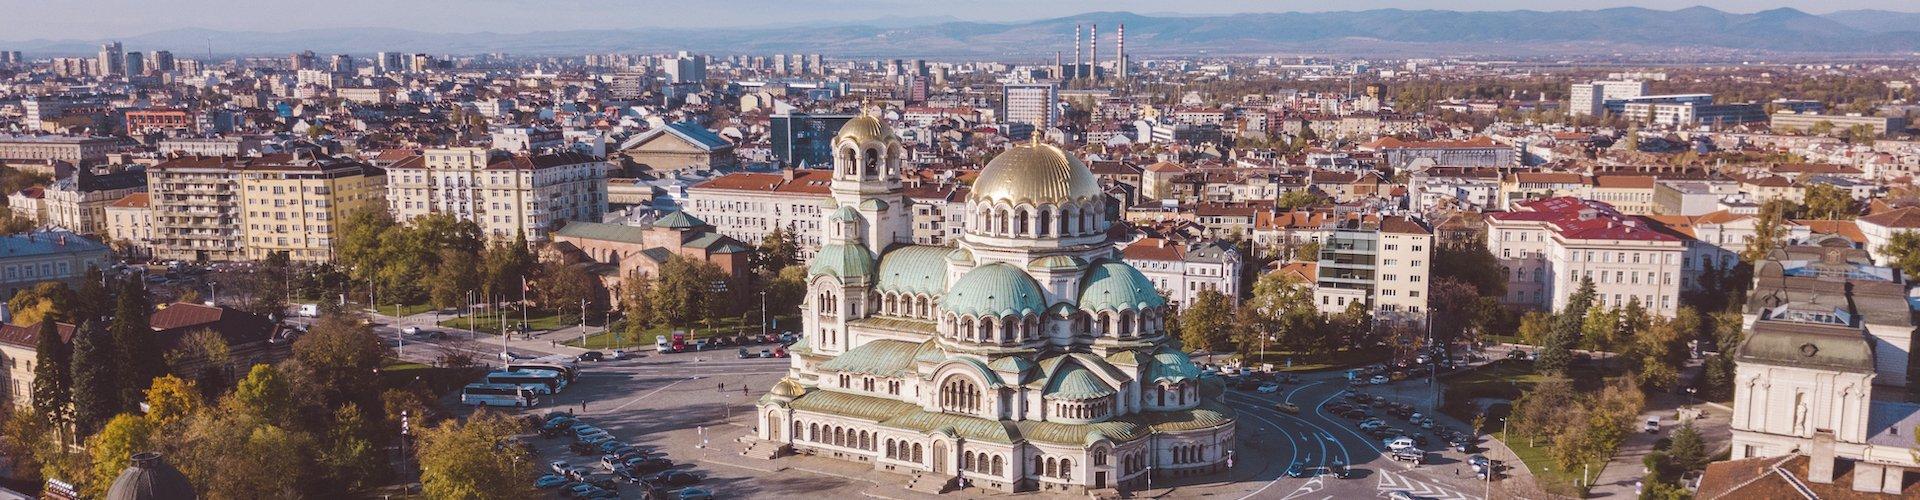 Ausflugsziel Sofia